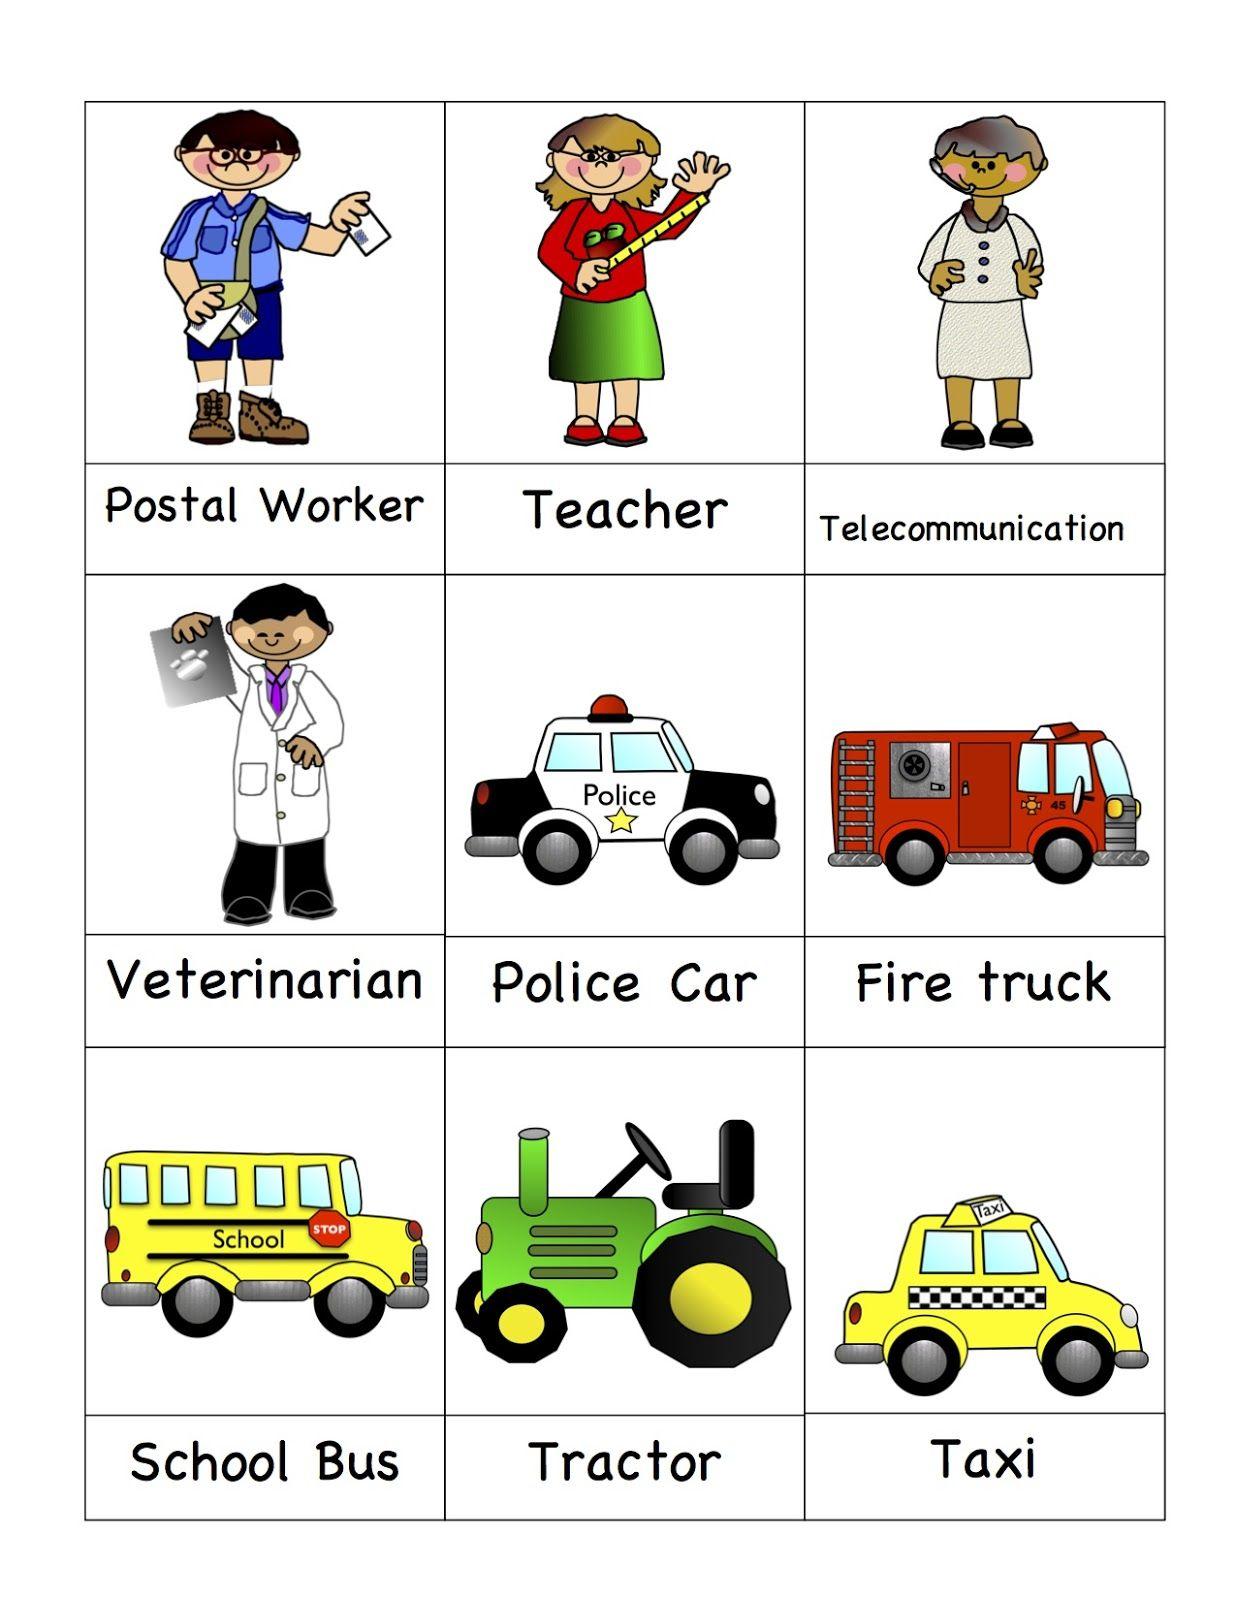 Preschool Pr T Bles Munity Helpers M Ny Free Pr T Bles